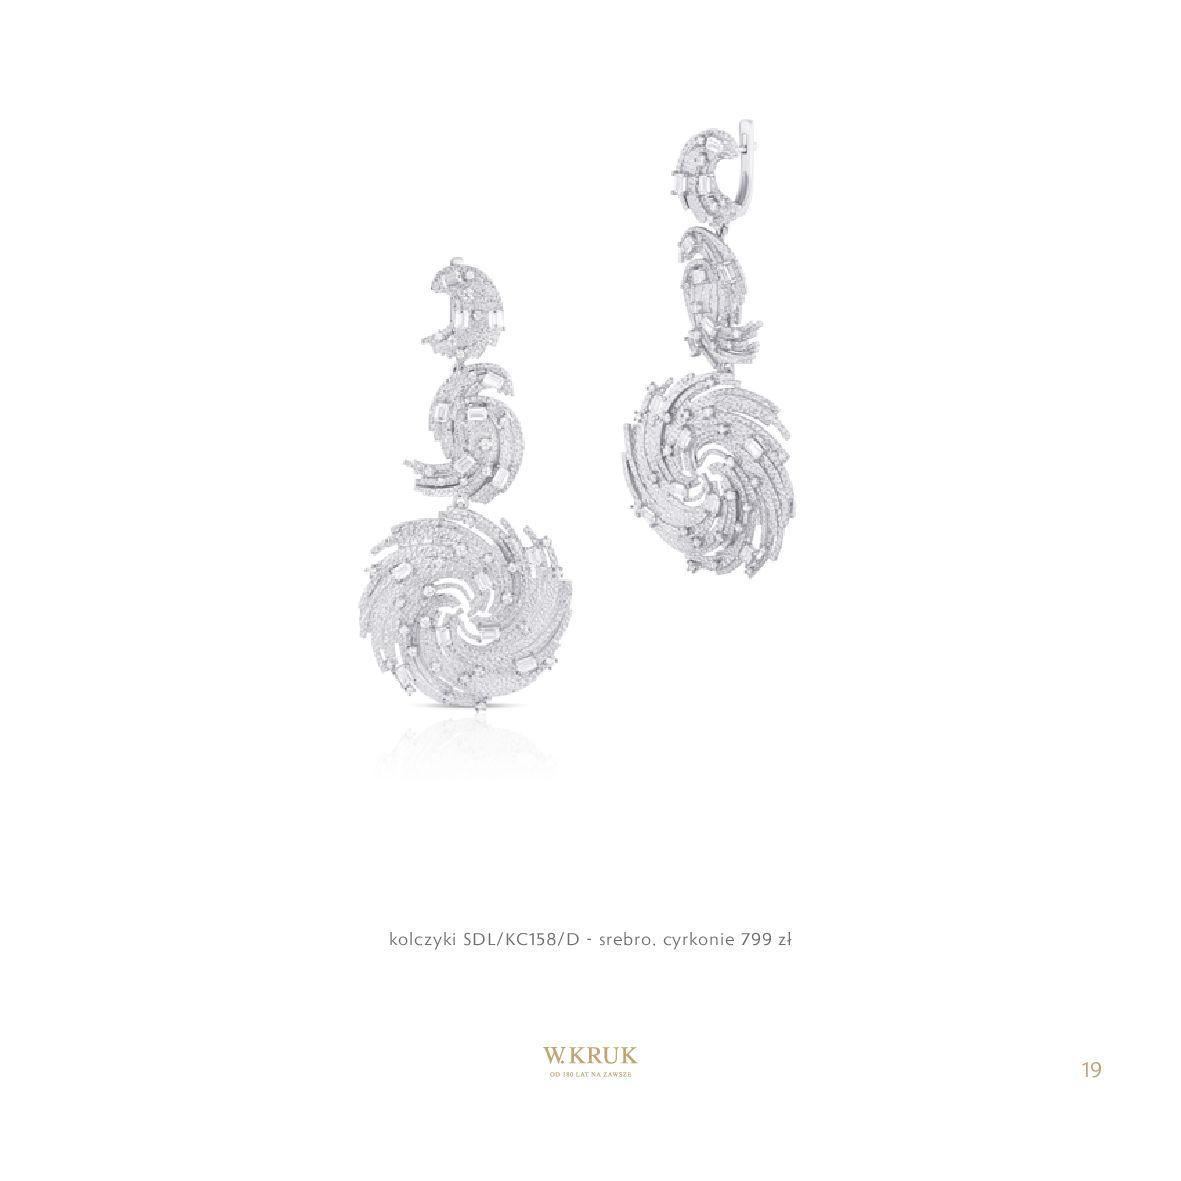 Gazetka W. KRUK: Katalog - Kolekcja Blask 2021-02-17 page-20